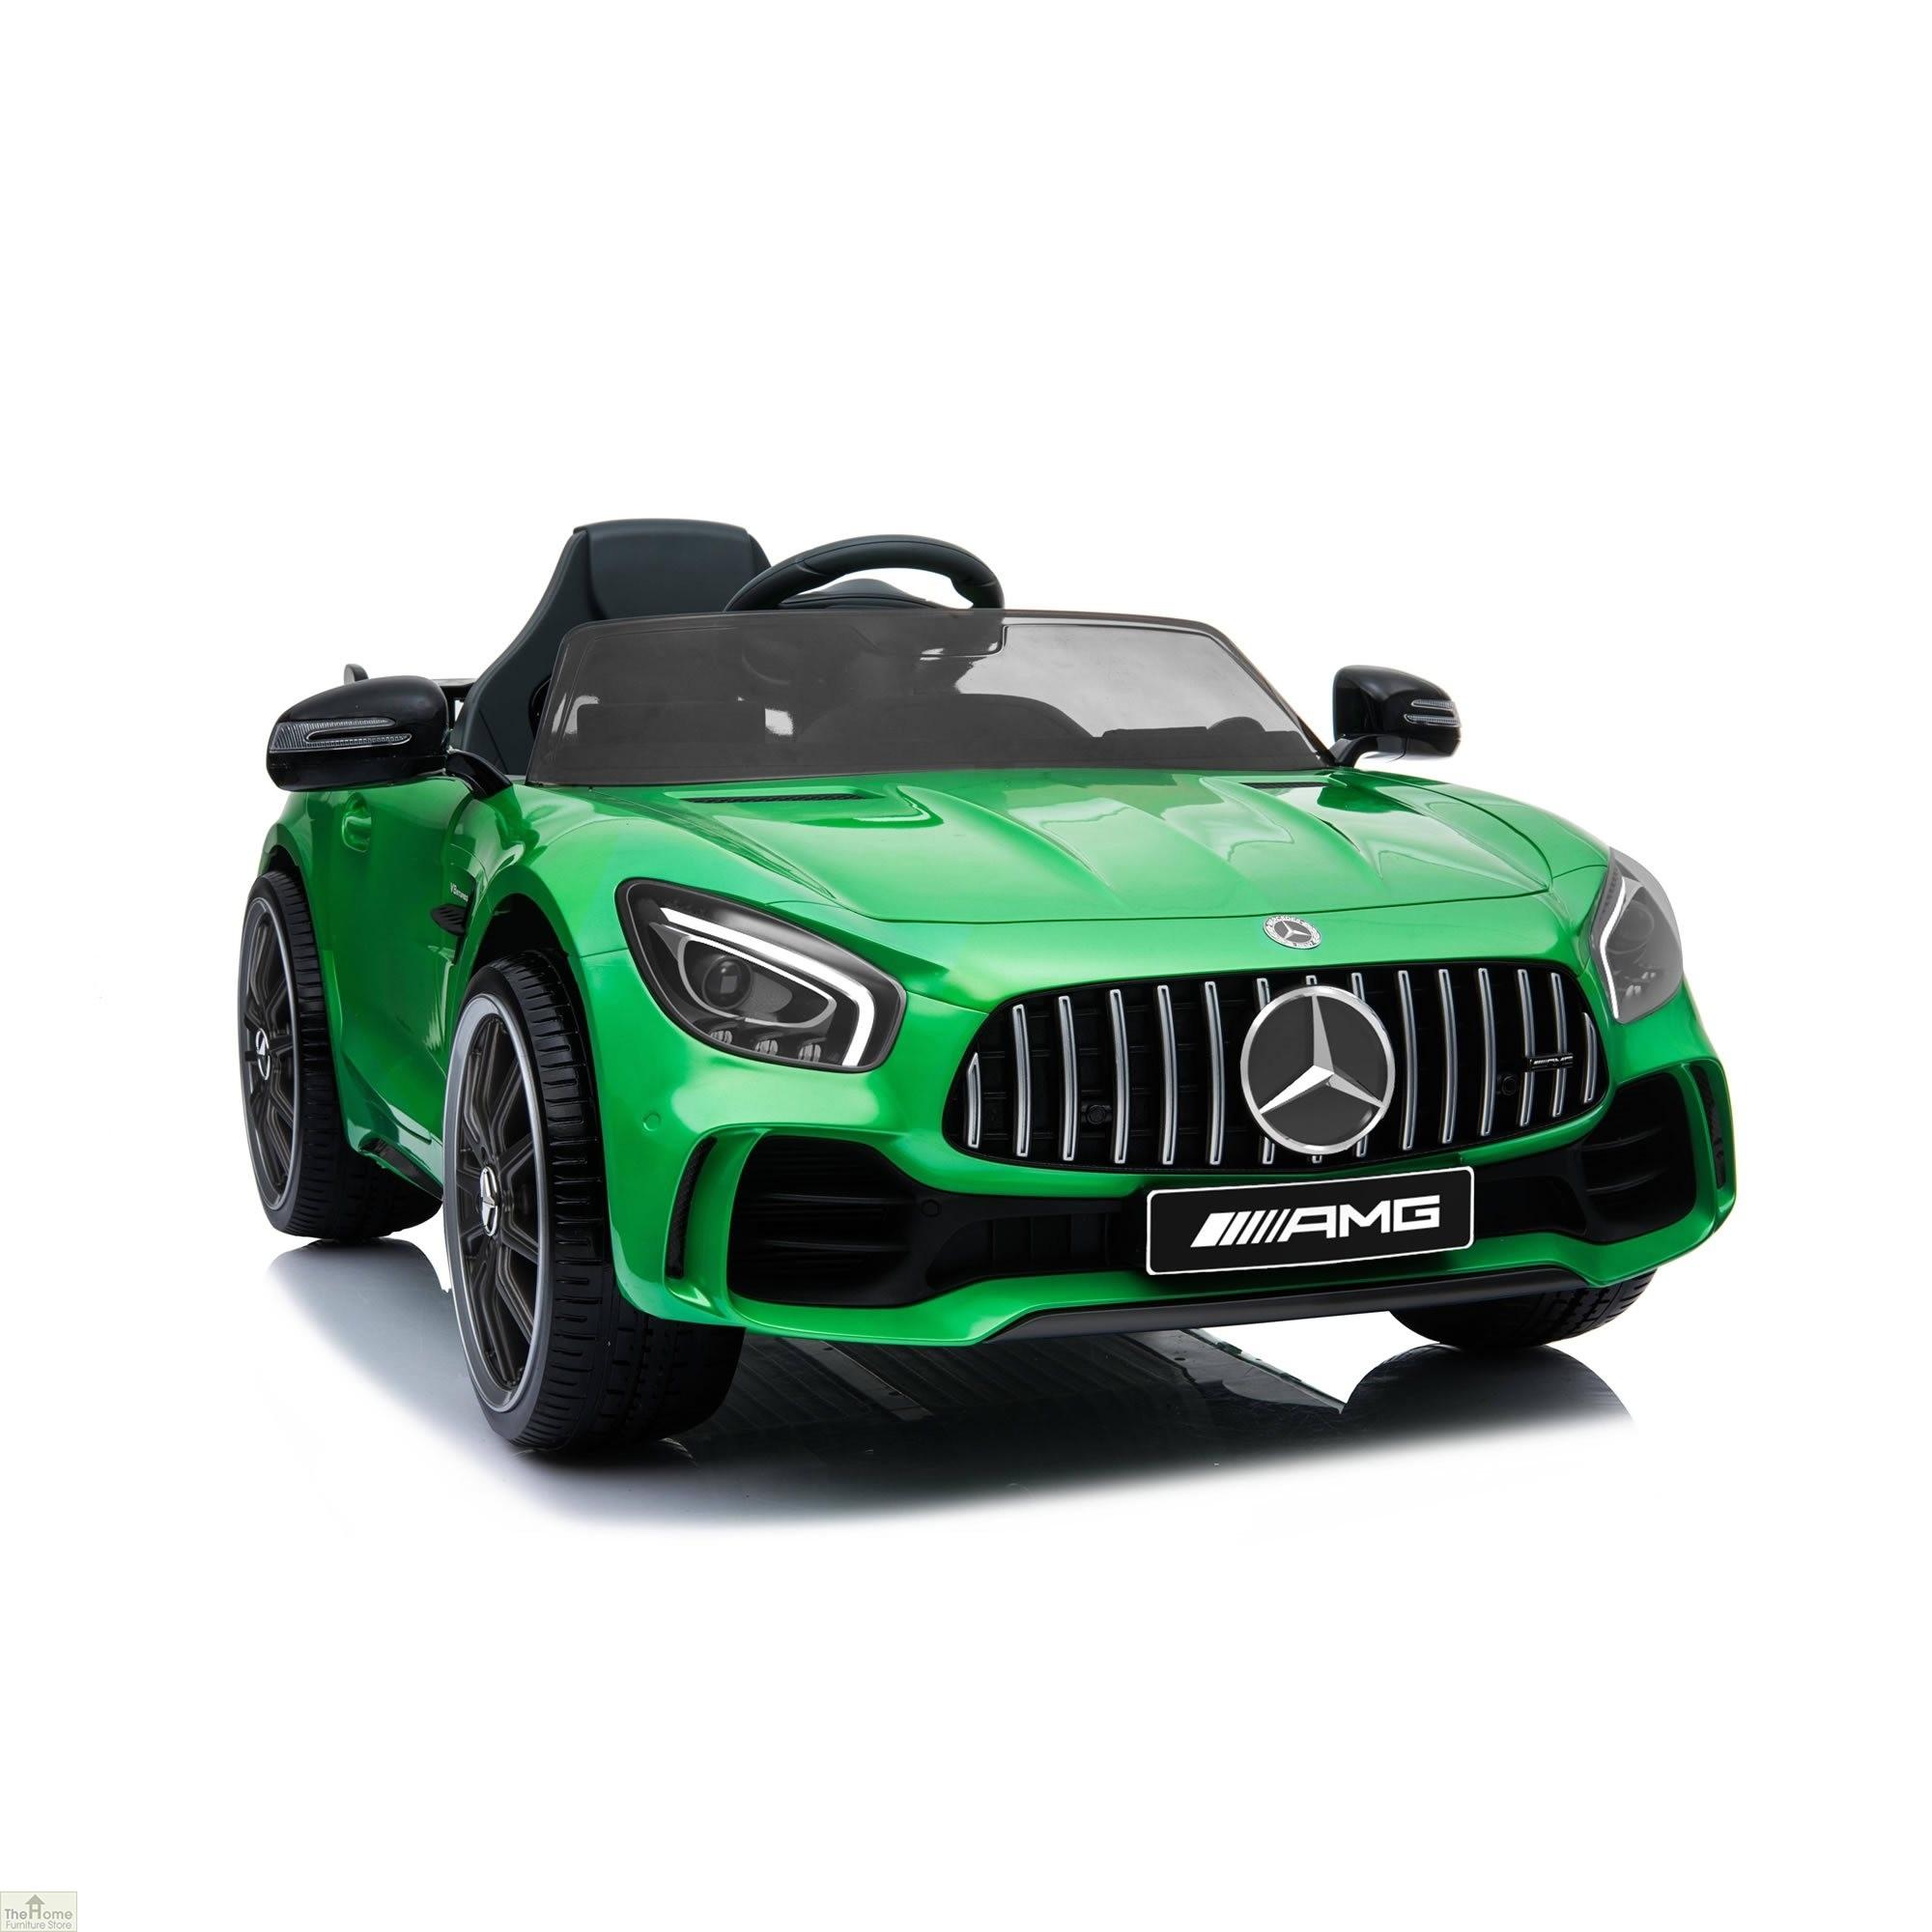 Mercedes Benz GTR 12v Ride On Car